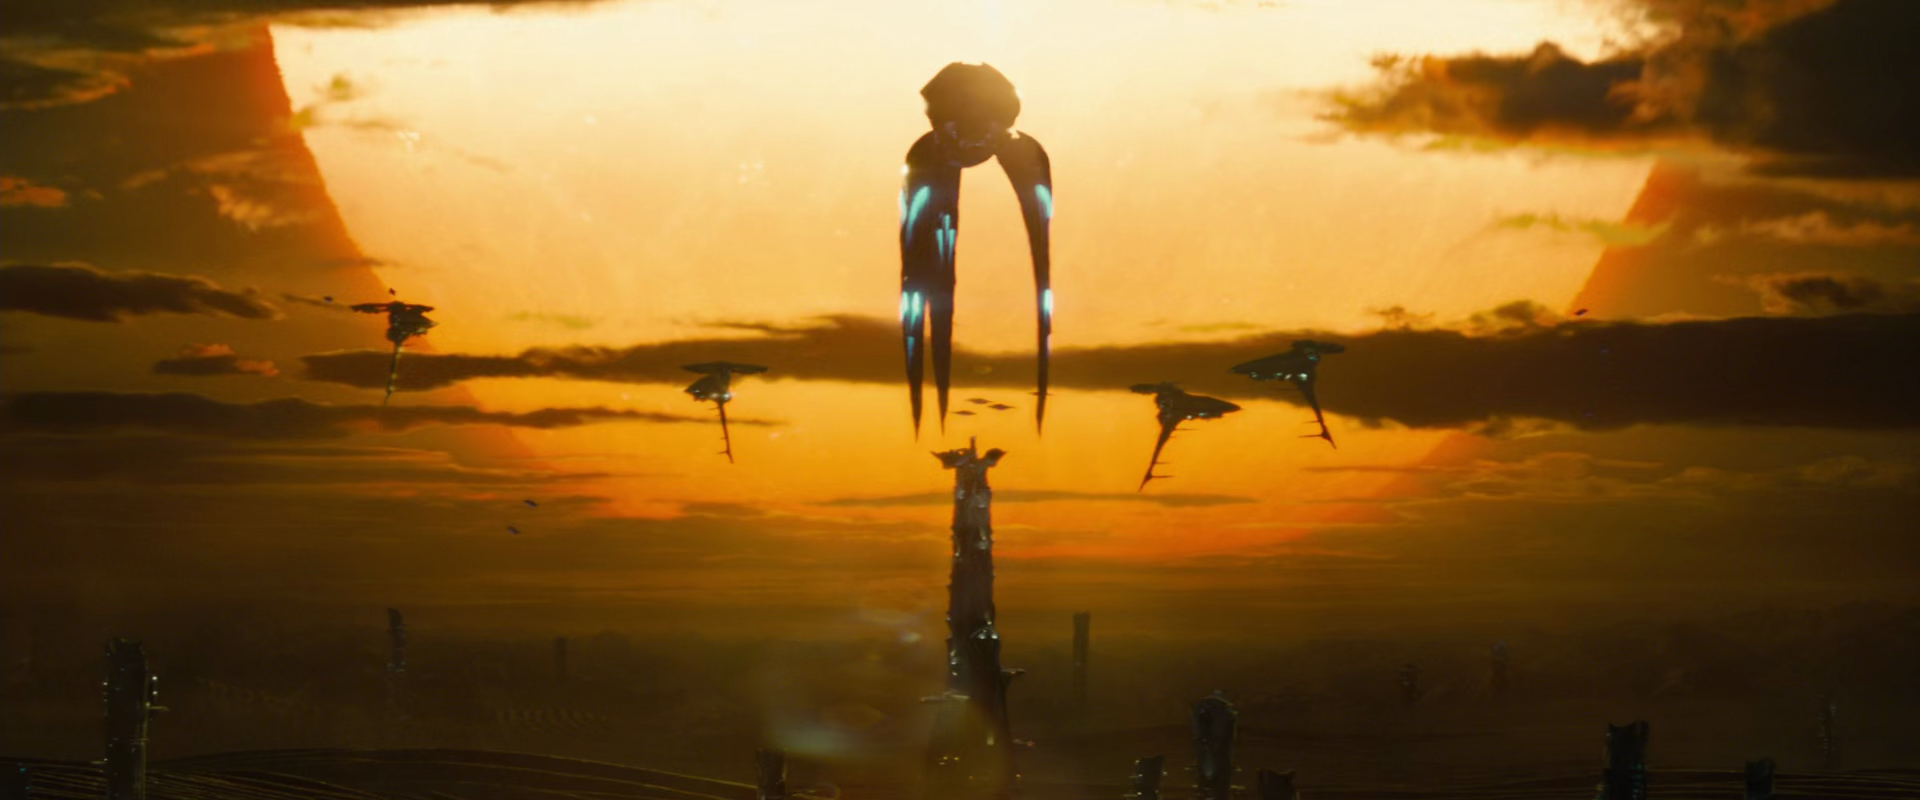 Download Man Of Steel 2013 1080p 10bit BluRay 5 1 x265 HEVC-MZABI